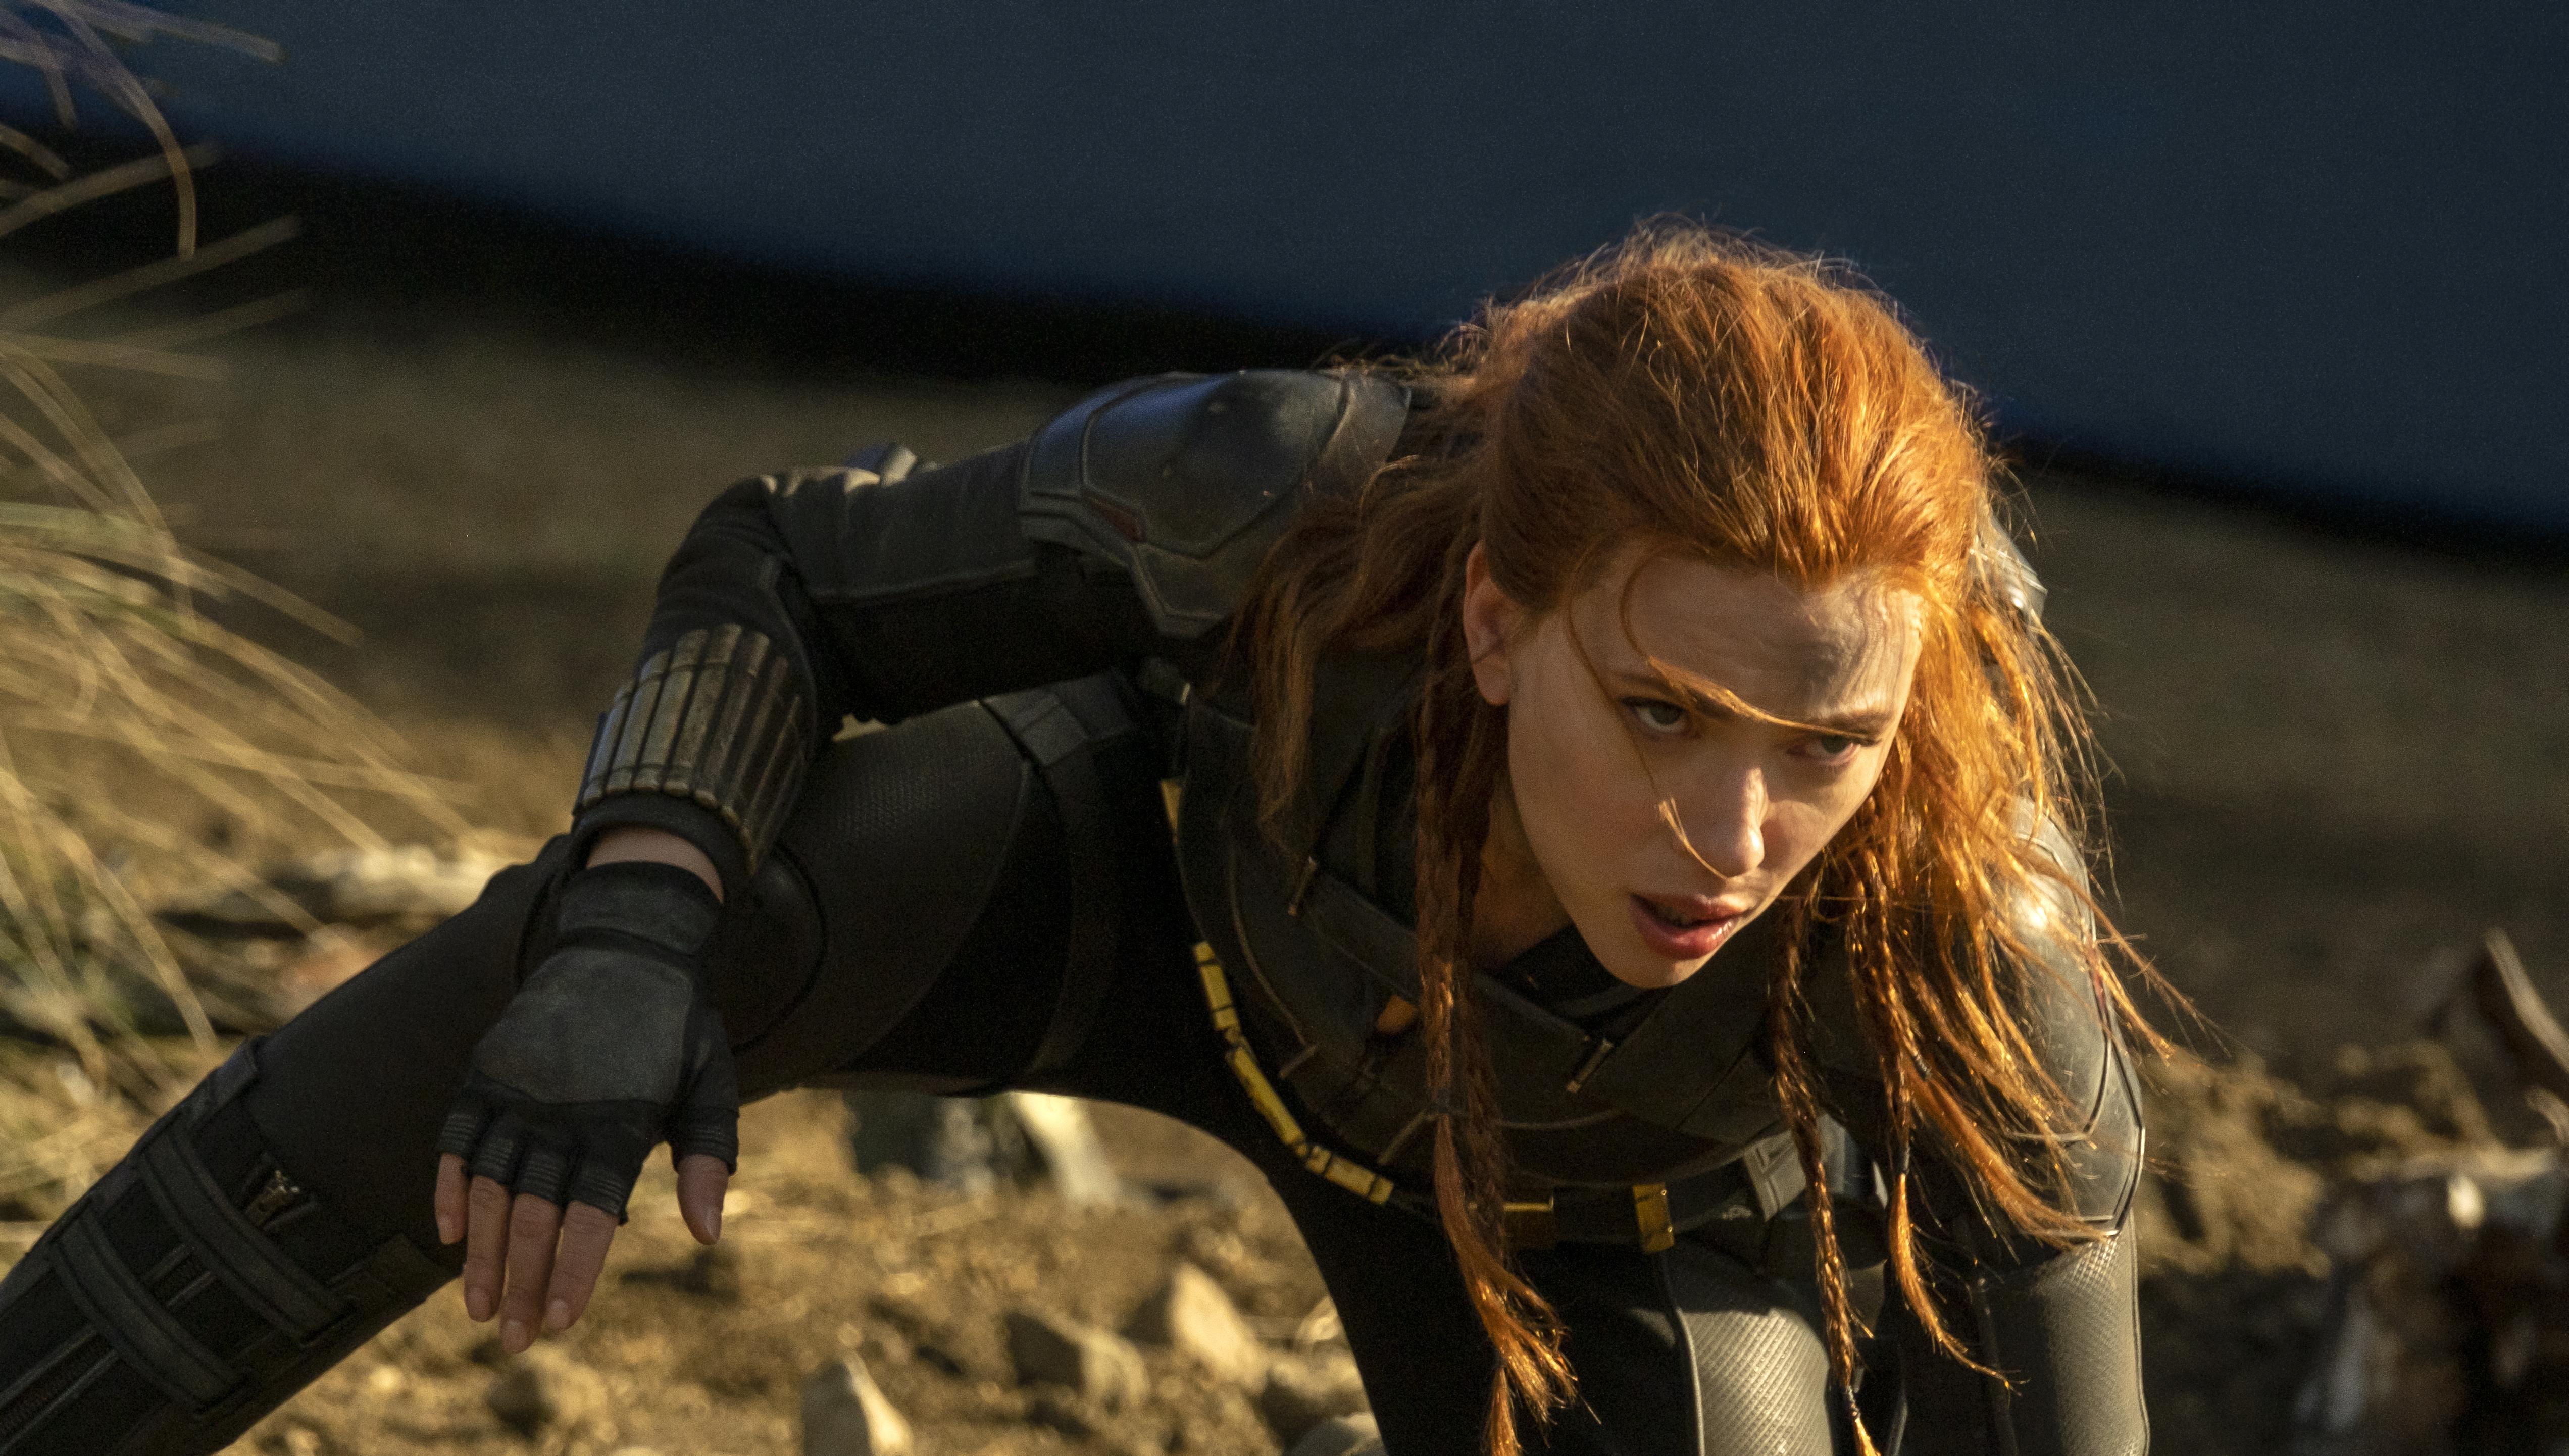 Scarlett Johansson, Jay Maidment, and Natasha Romanoff in Black Widow (2021)